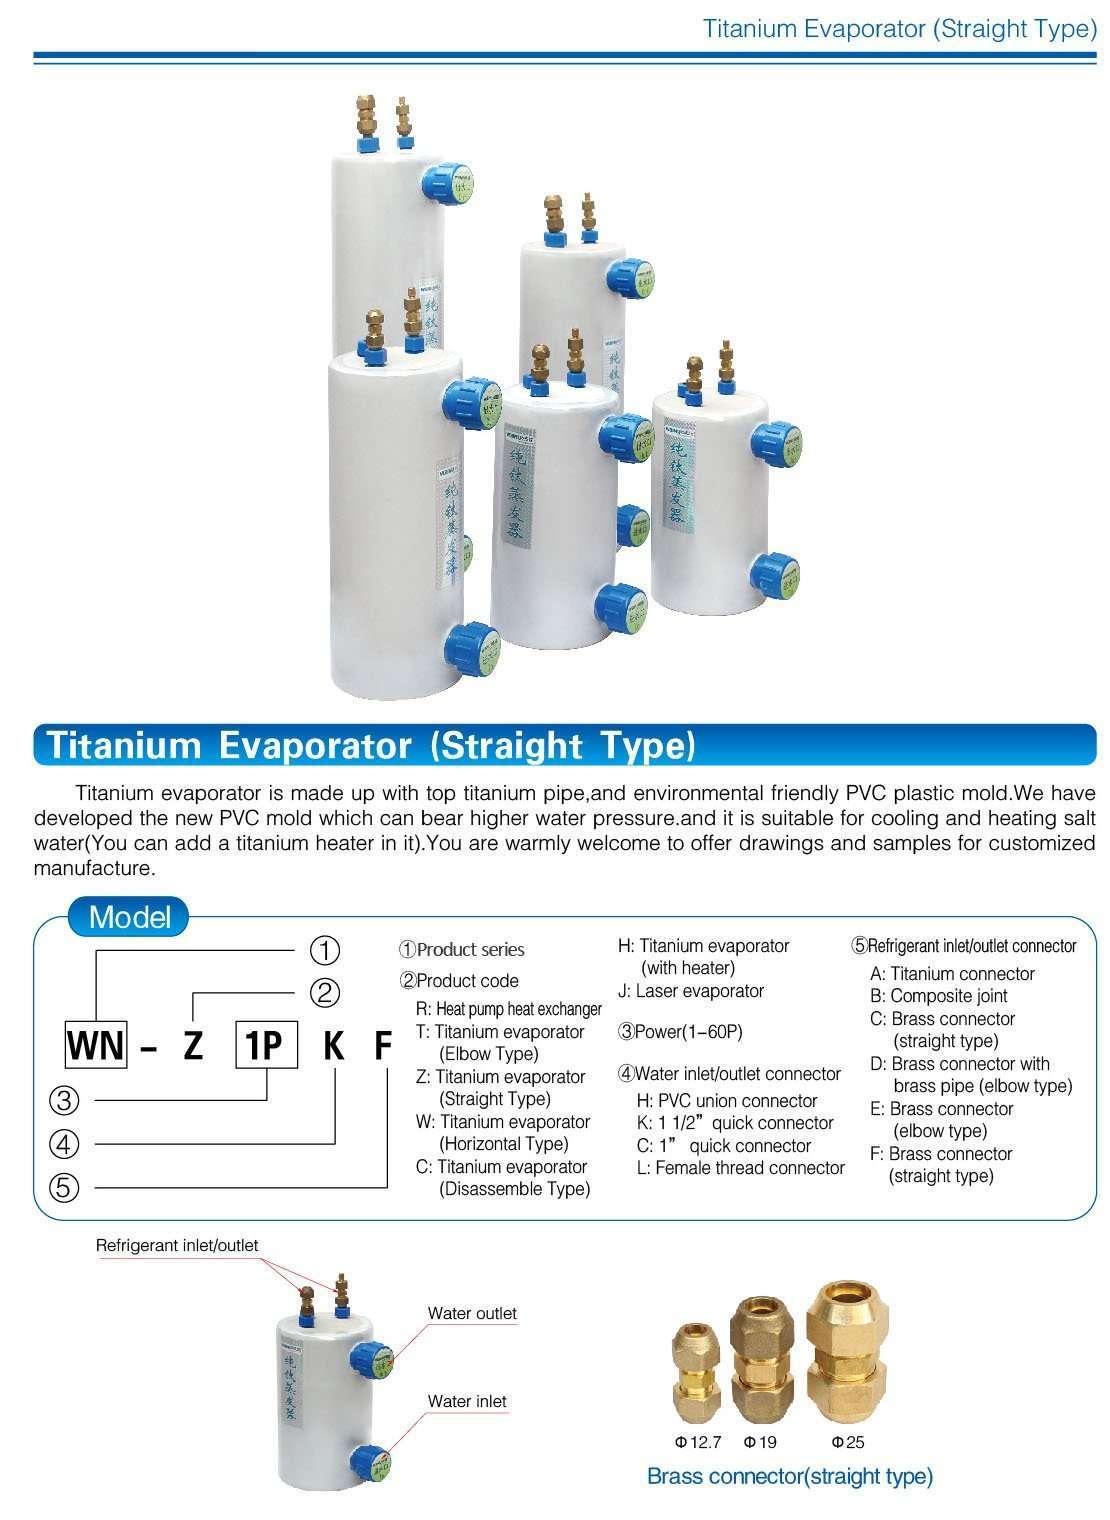 titanium coil evaporator heat exchanger straight type 02